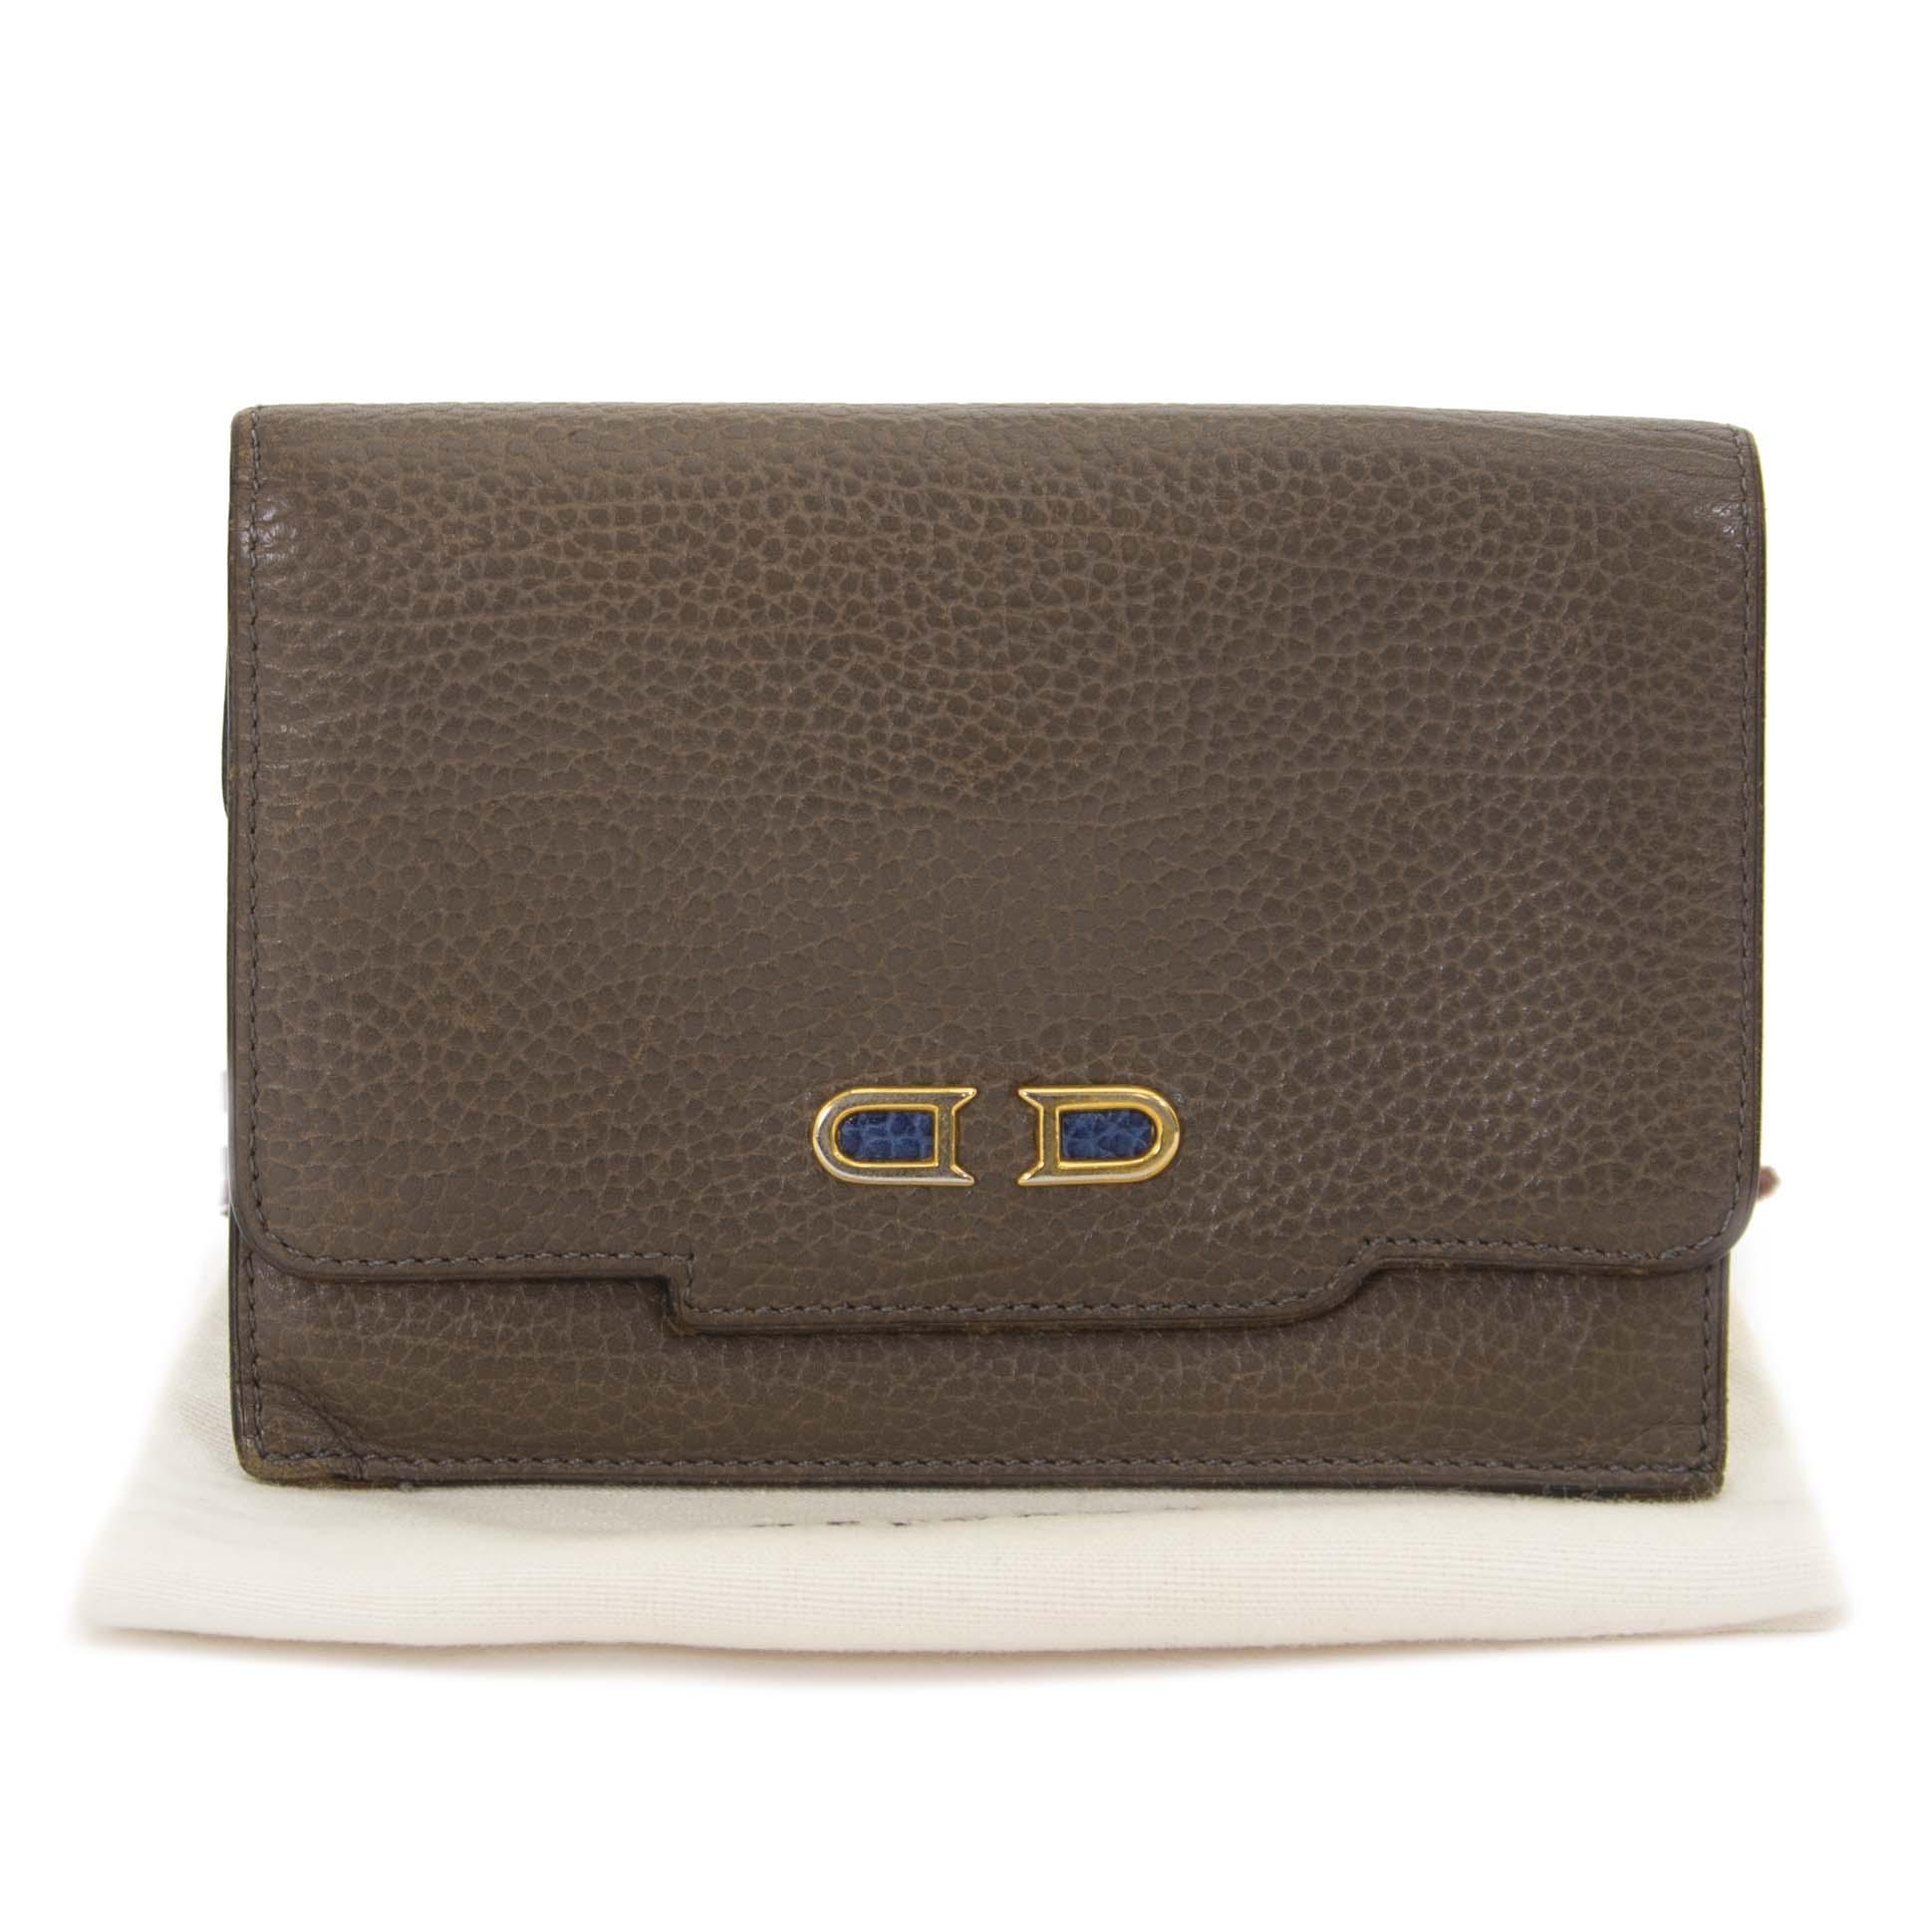 Delvaux Taupe portefeuille nu te koop bij labellov vintage mode webshop belgië